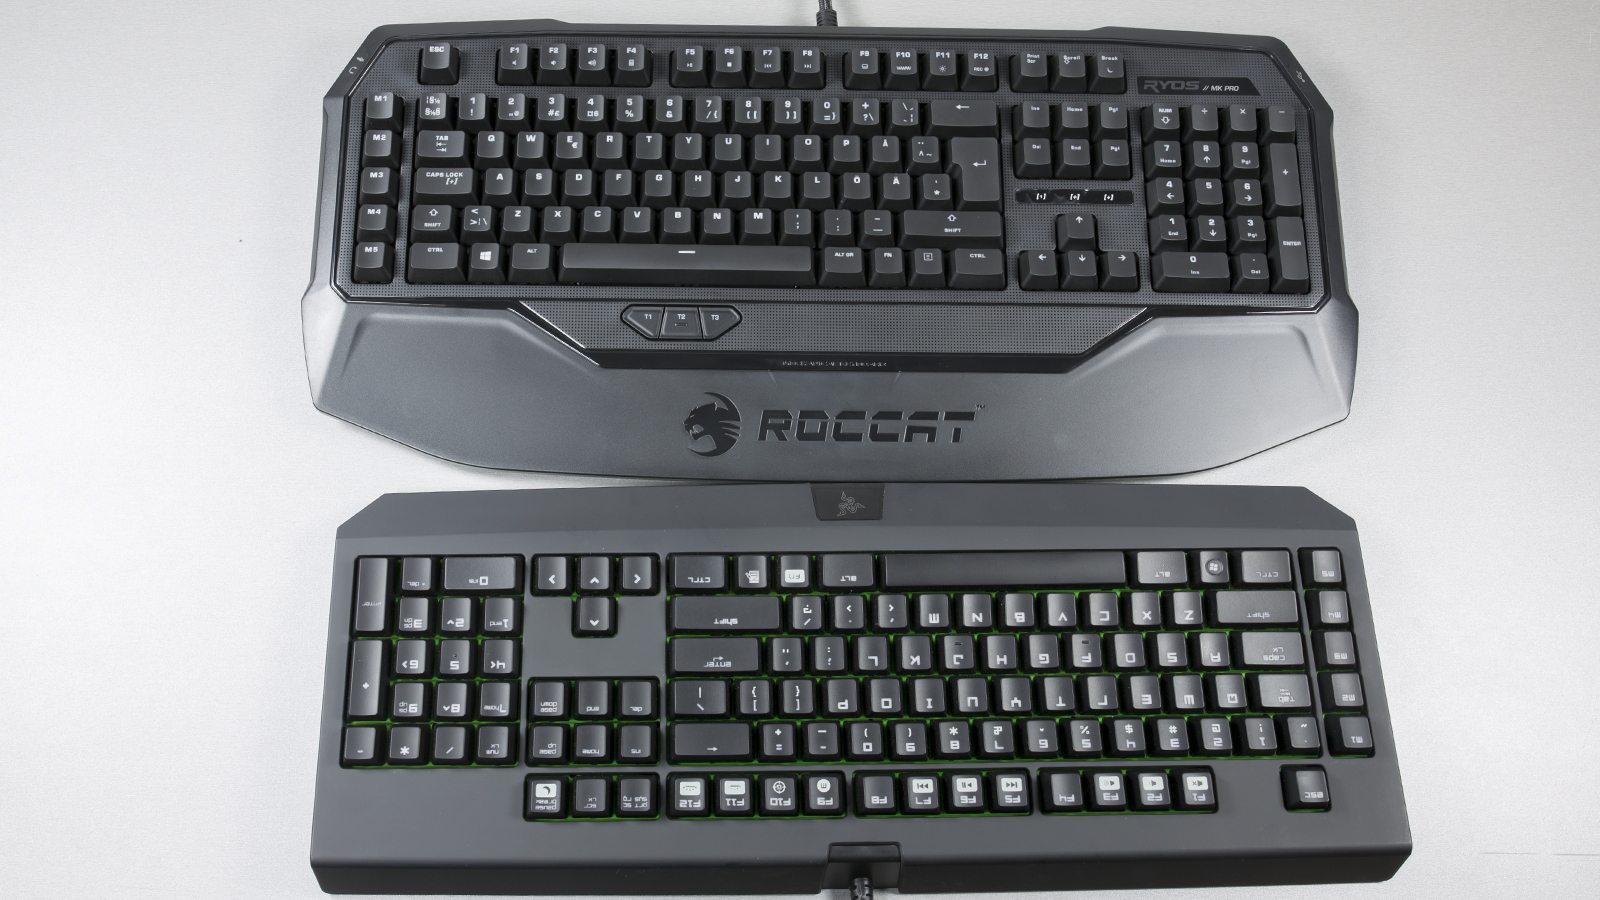 Roccat Ryos MK Pro ning Razer BlackWidow Ultimate klaviatuur kõrvuti